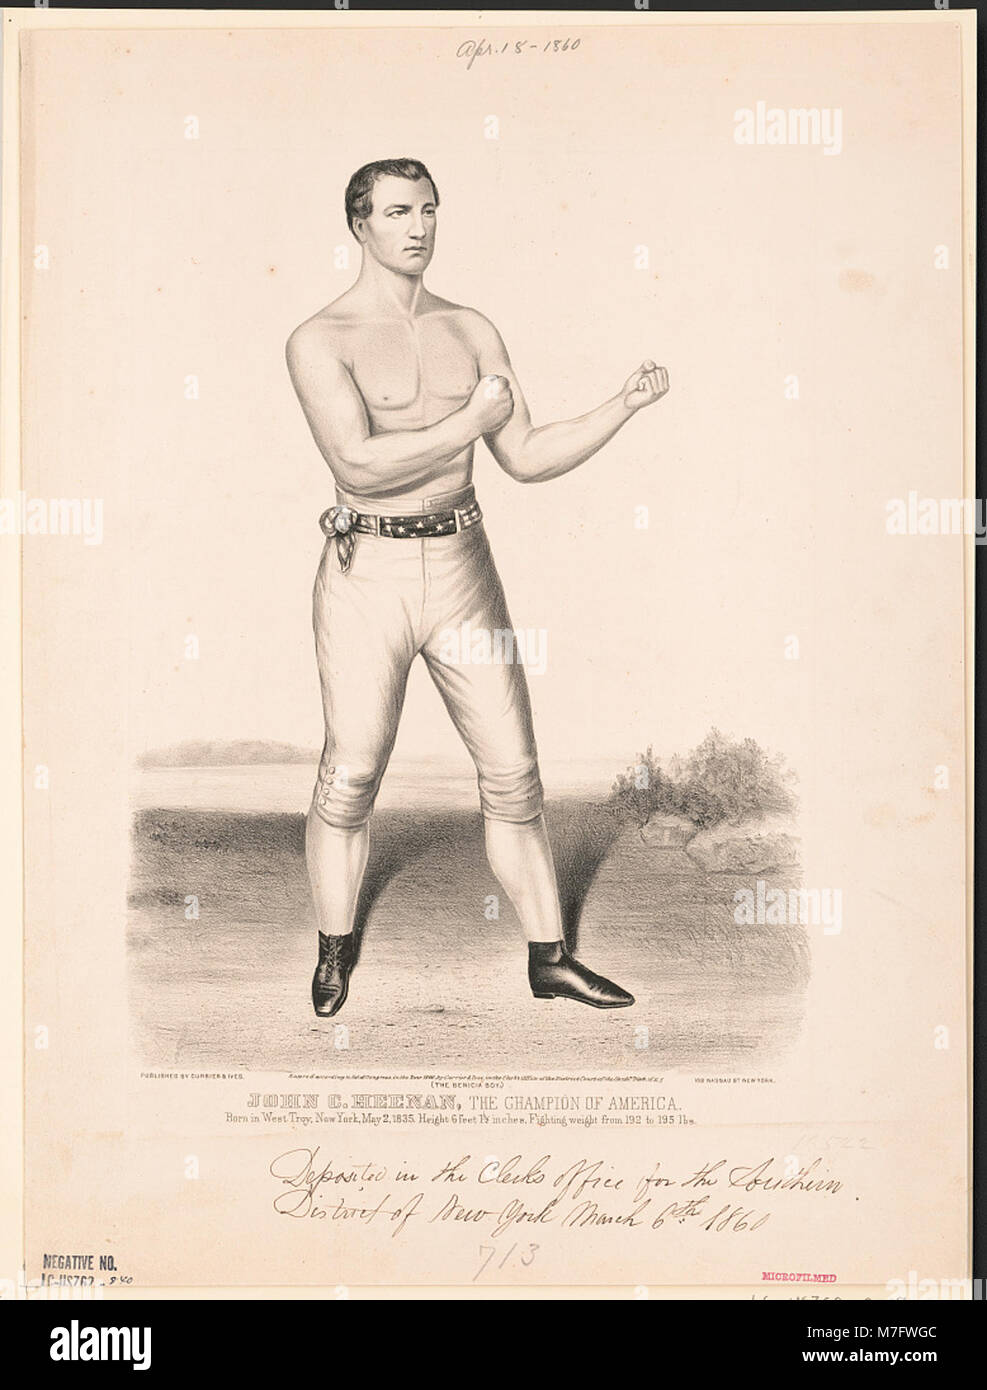 John C. Heenan, the champion of America- (the benicia boy) LCCN2002707678 - Stock Image